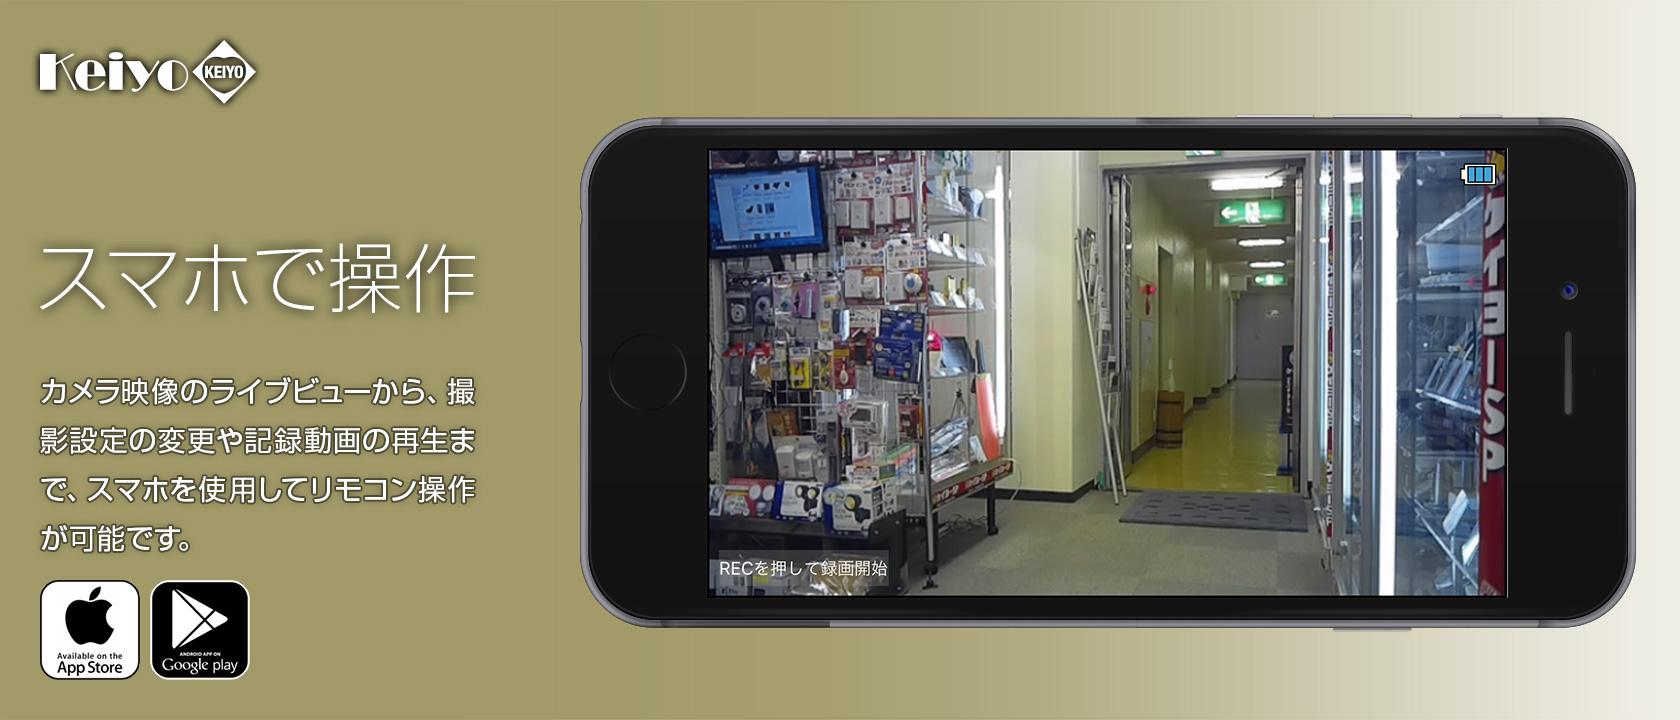 Wi-F接続可能な偽装カメラPC-300W